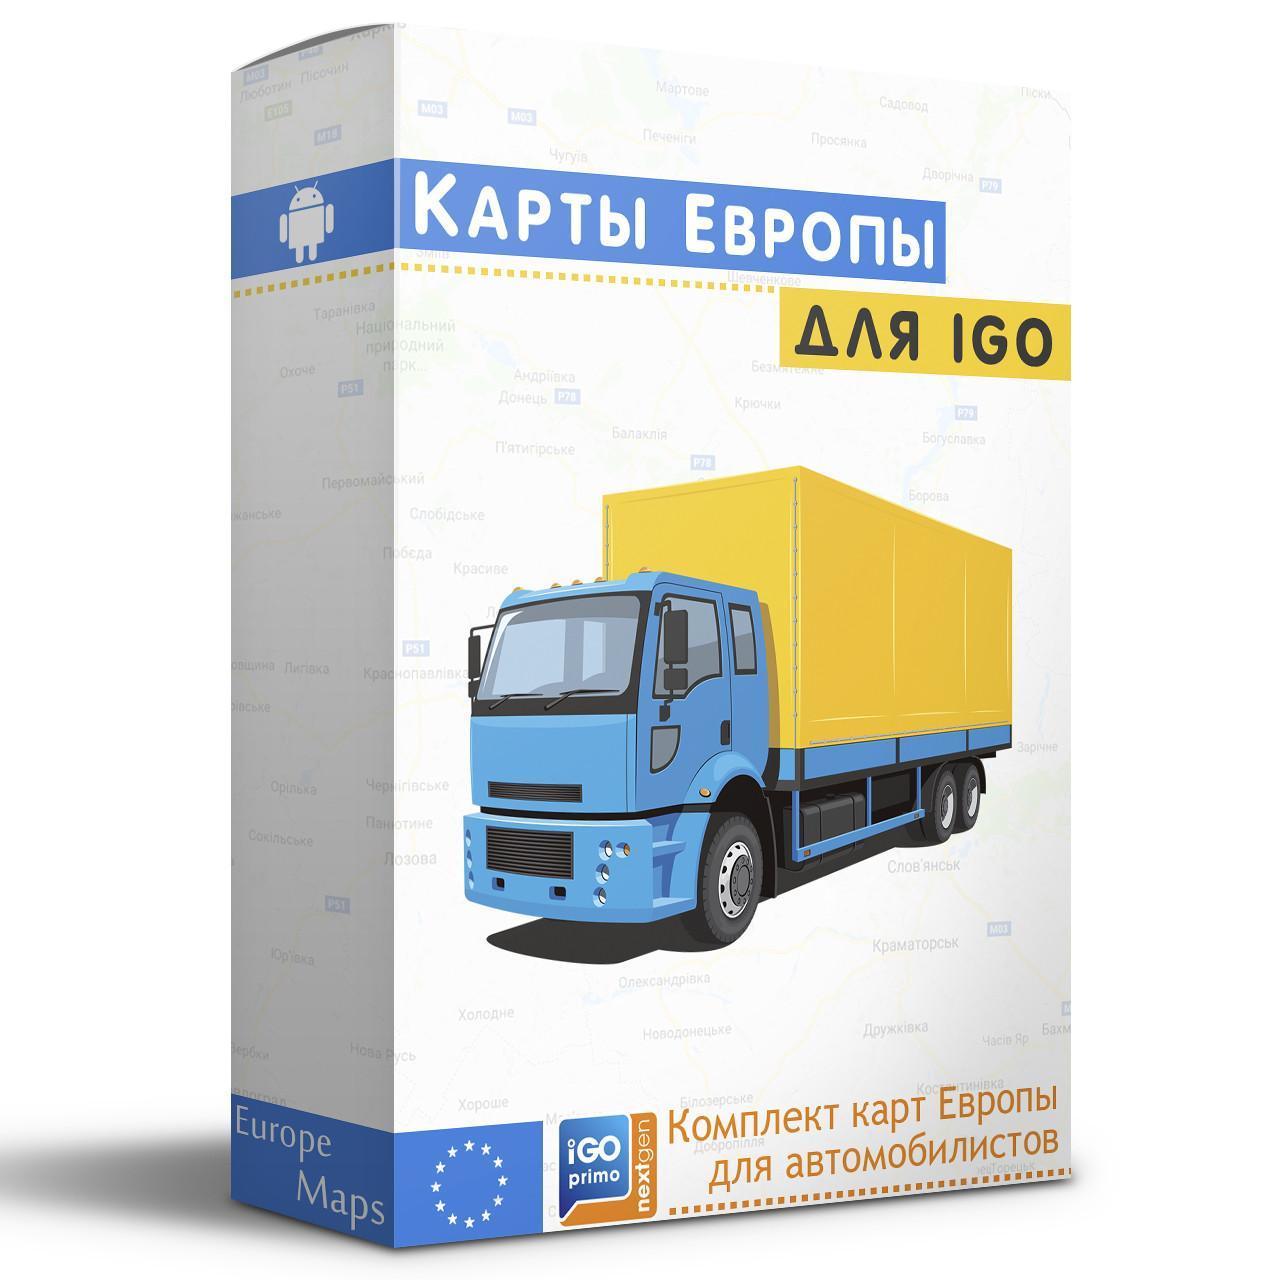 Комплект карт Европы IGO Primo (2256-5297)